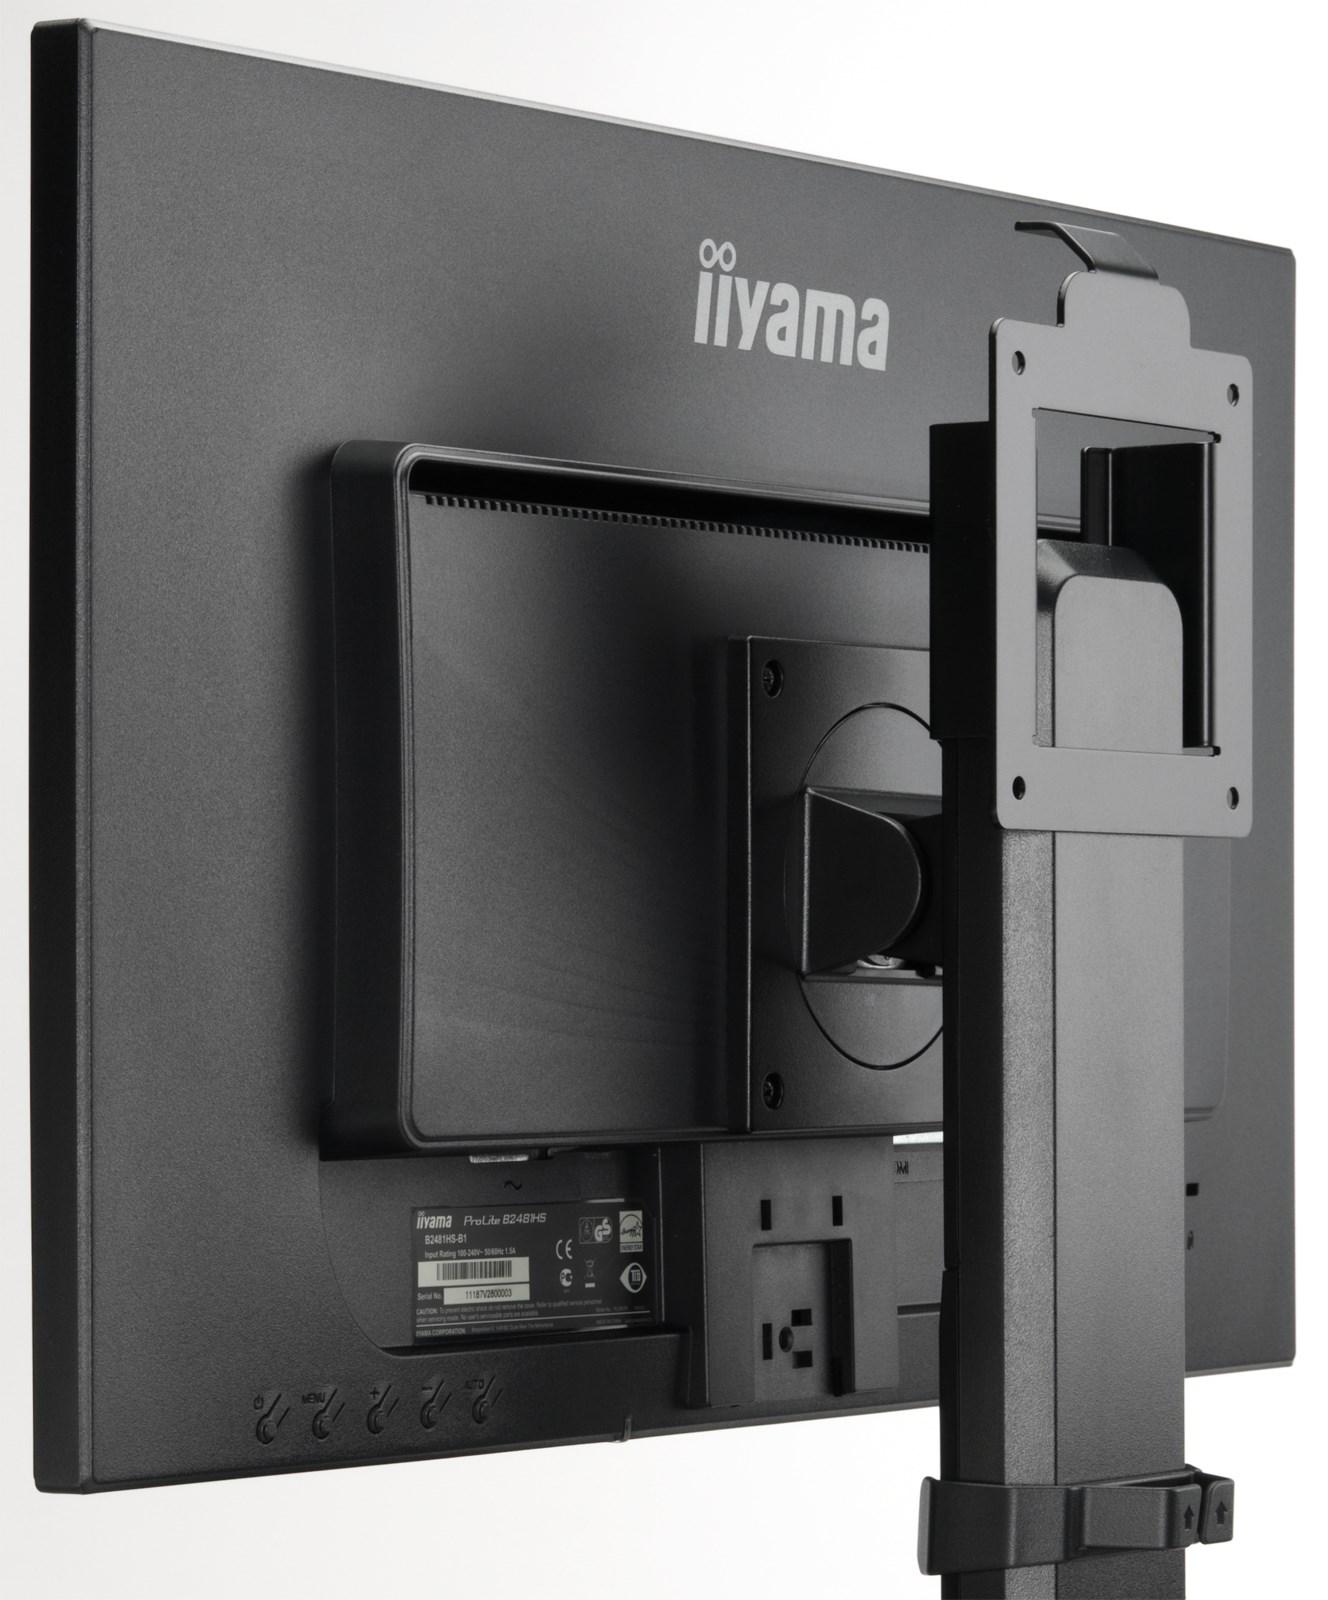 Iiyama Vesa Mount Bracket Black For Small Form Factor Pc